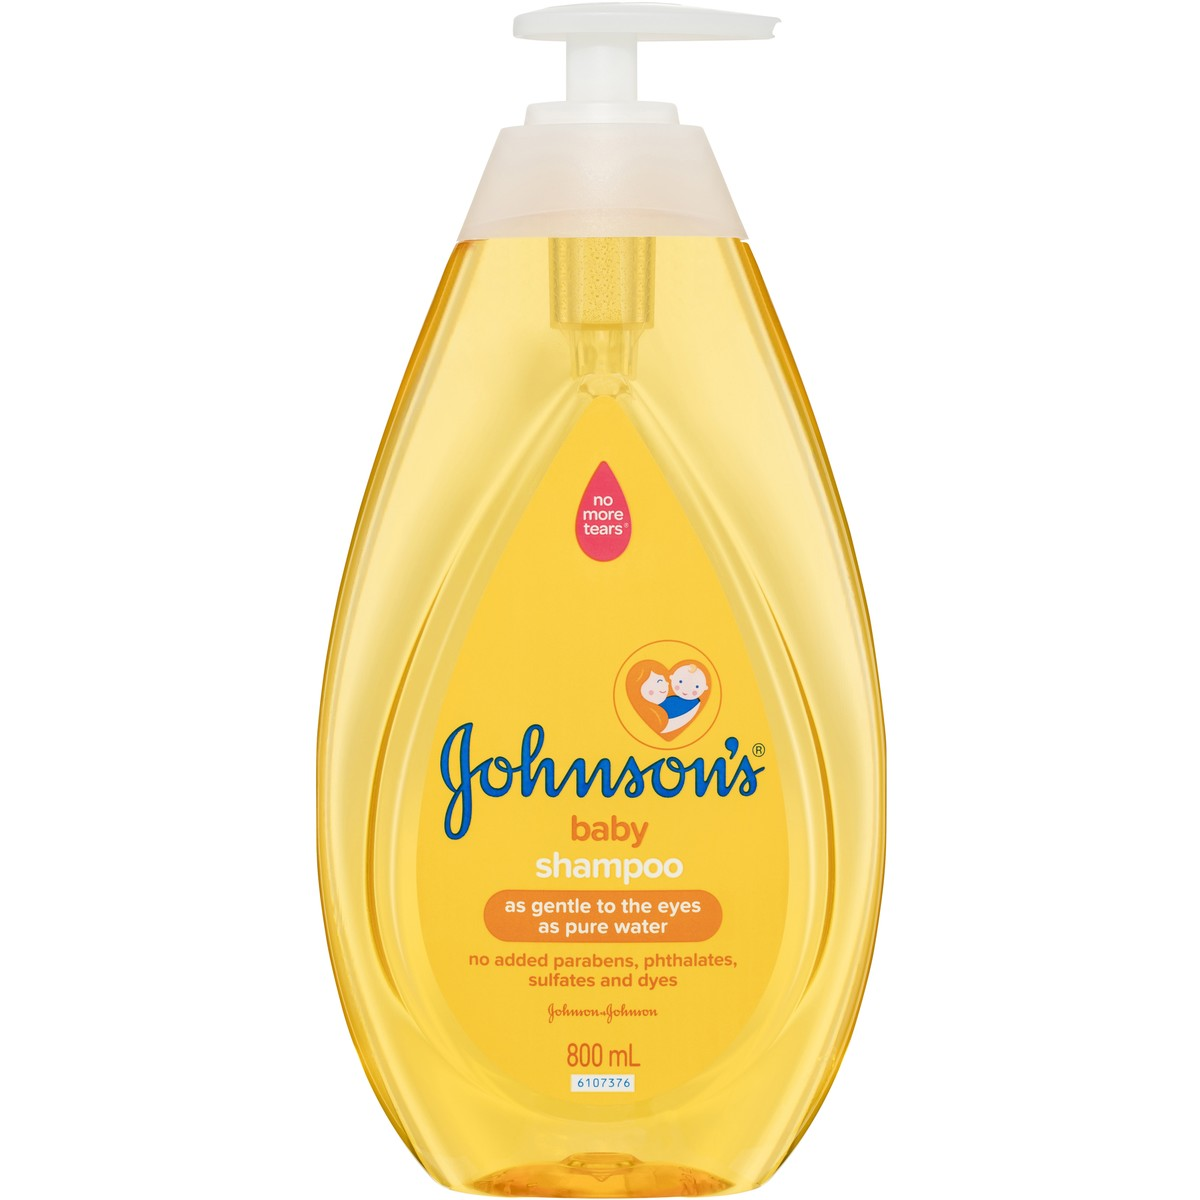 Johnson's Baby Shampoo 800mL | BIG W